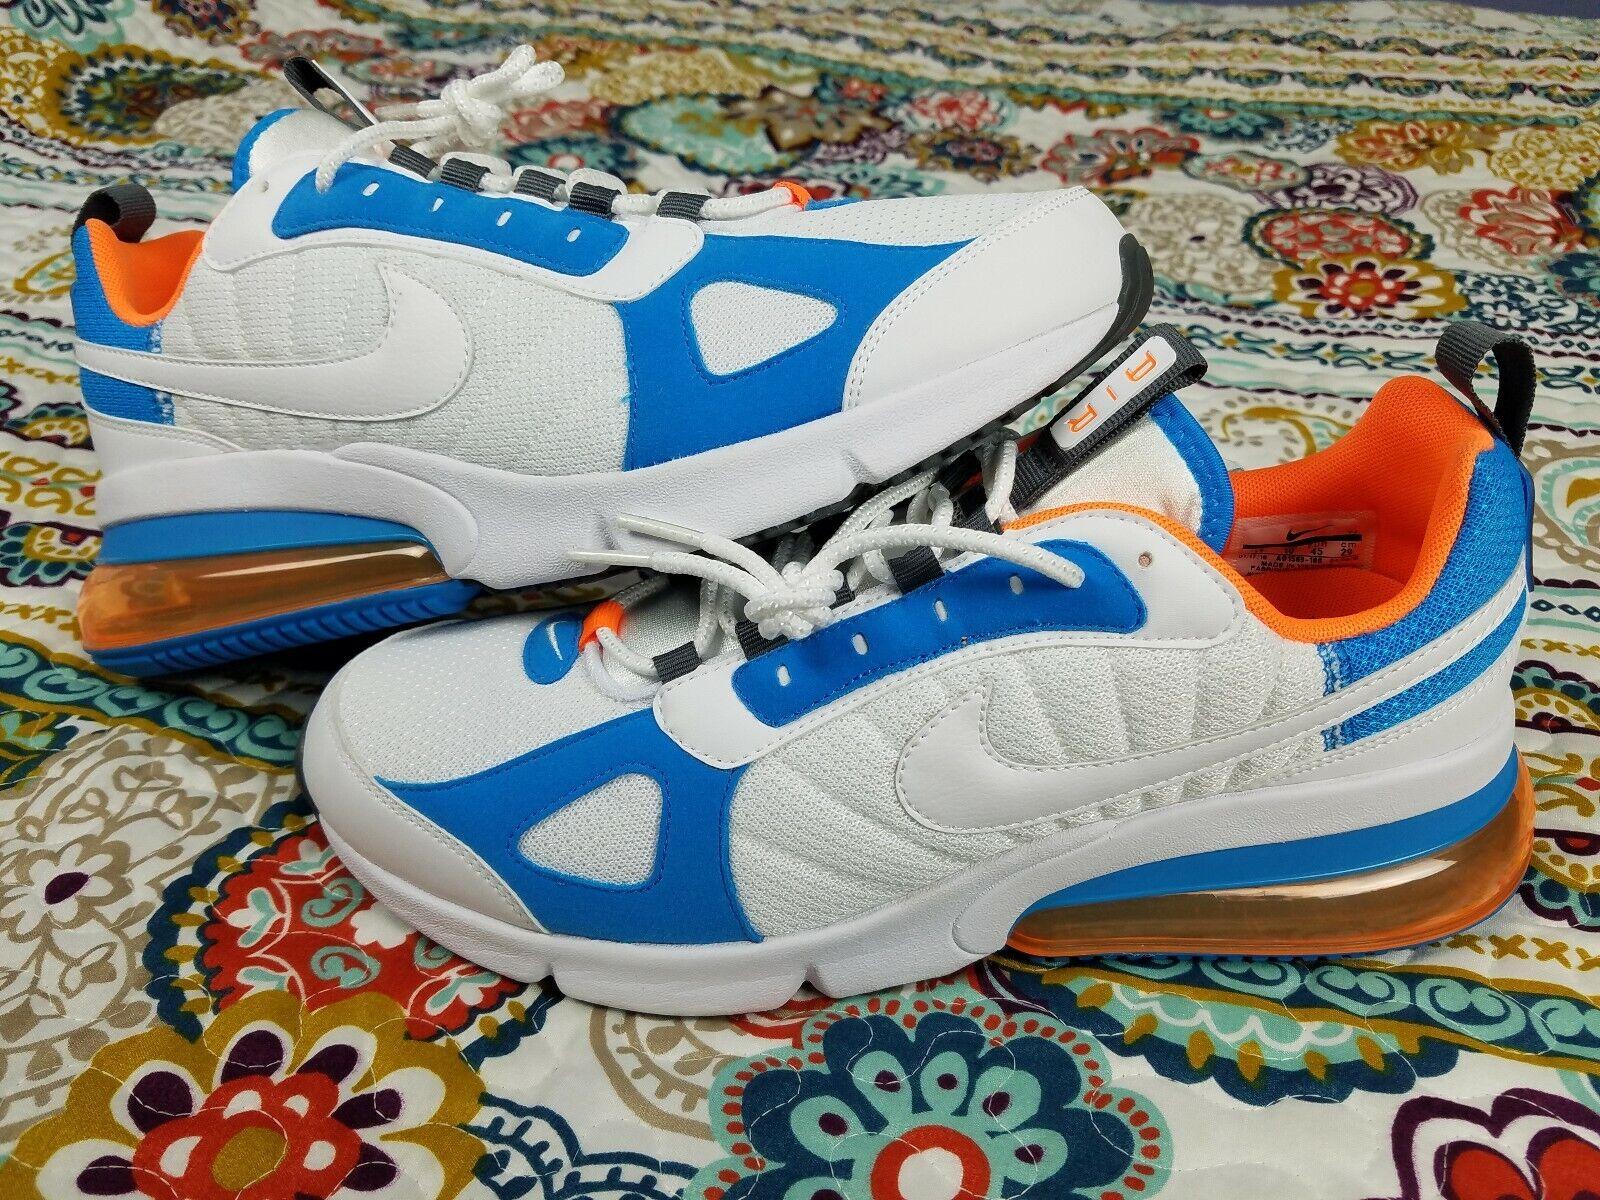 Nike Air Max 270 Futura Mens sz 11 Running shoes White & orange  AO1569-100 NEW